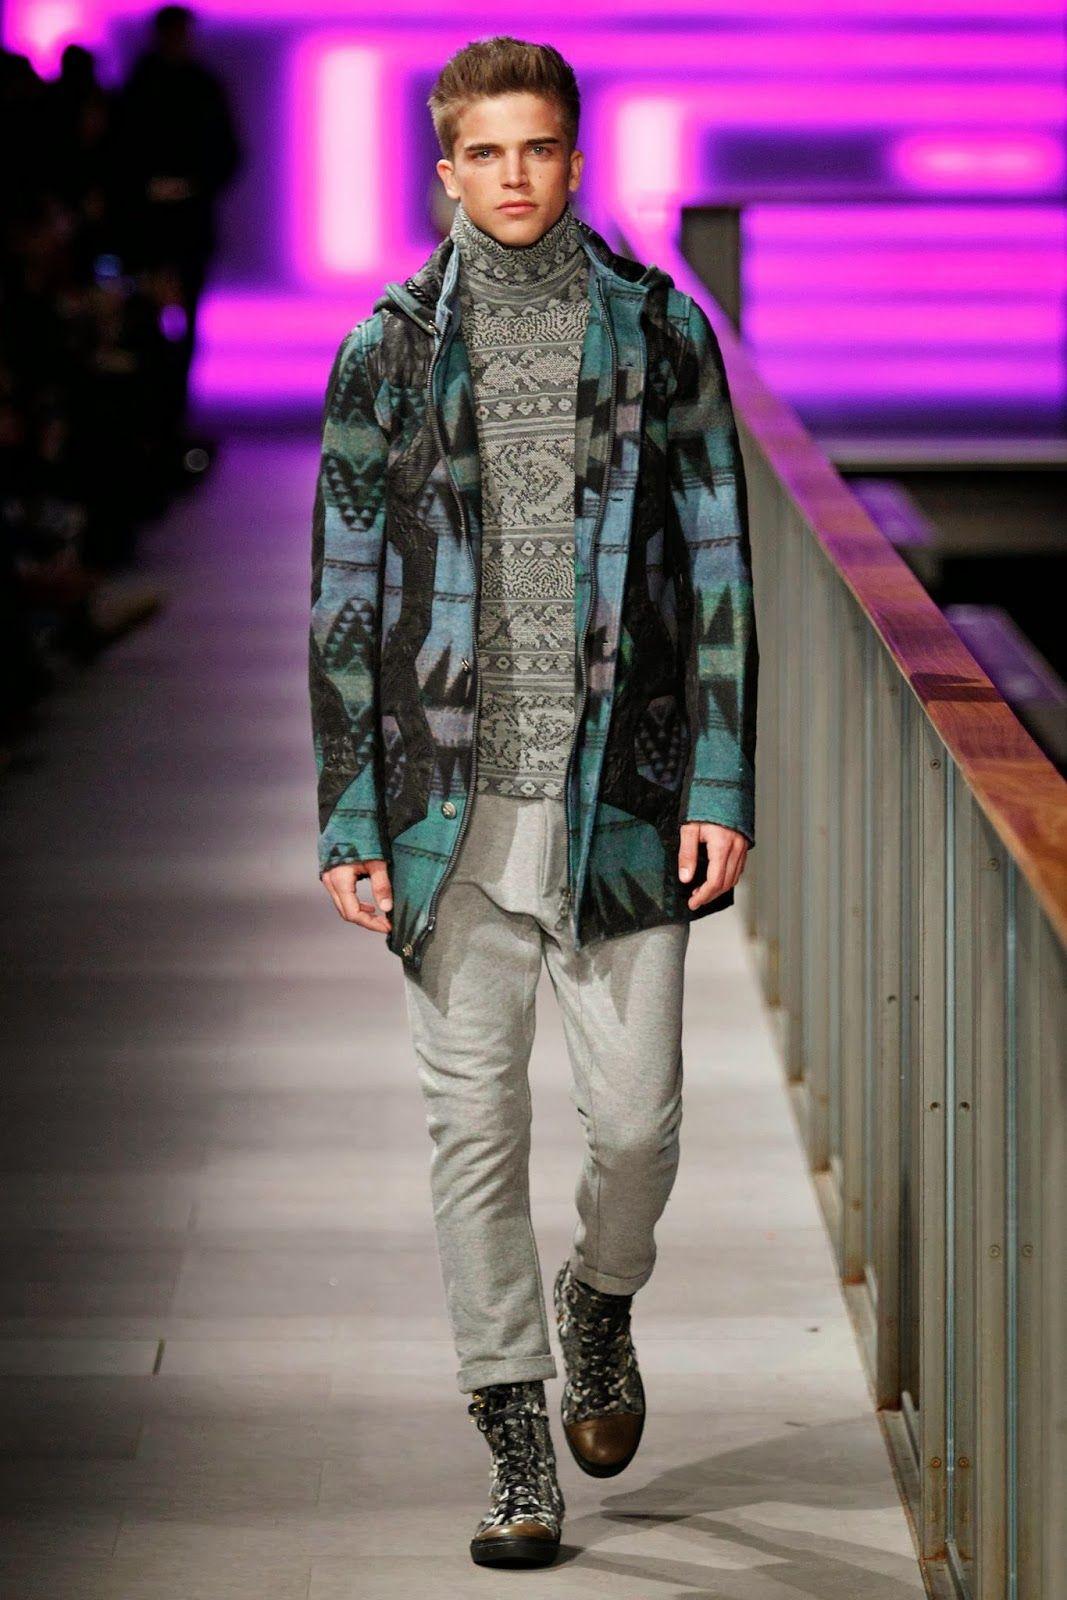 #Menswear #Trends CUSTO BARCELONA Fall Winter 2014 Otoño Invierno  #Moda Hombre #Tendencias